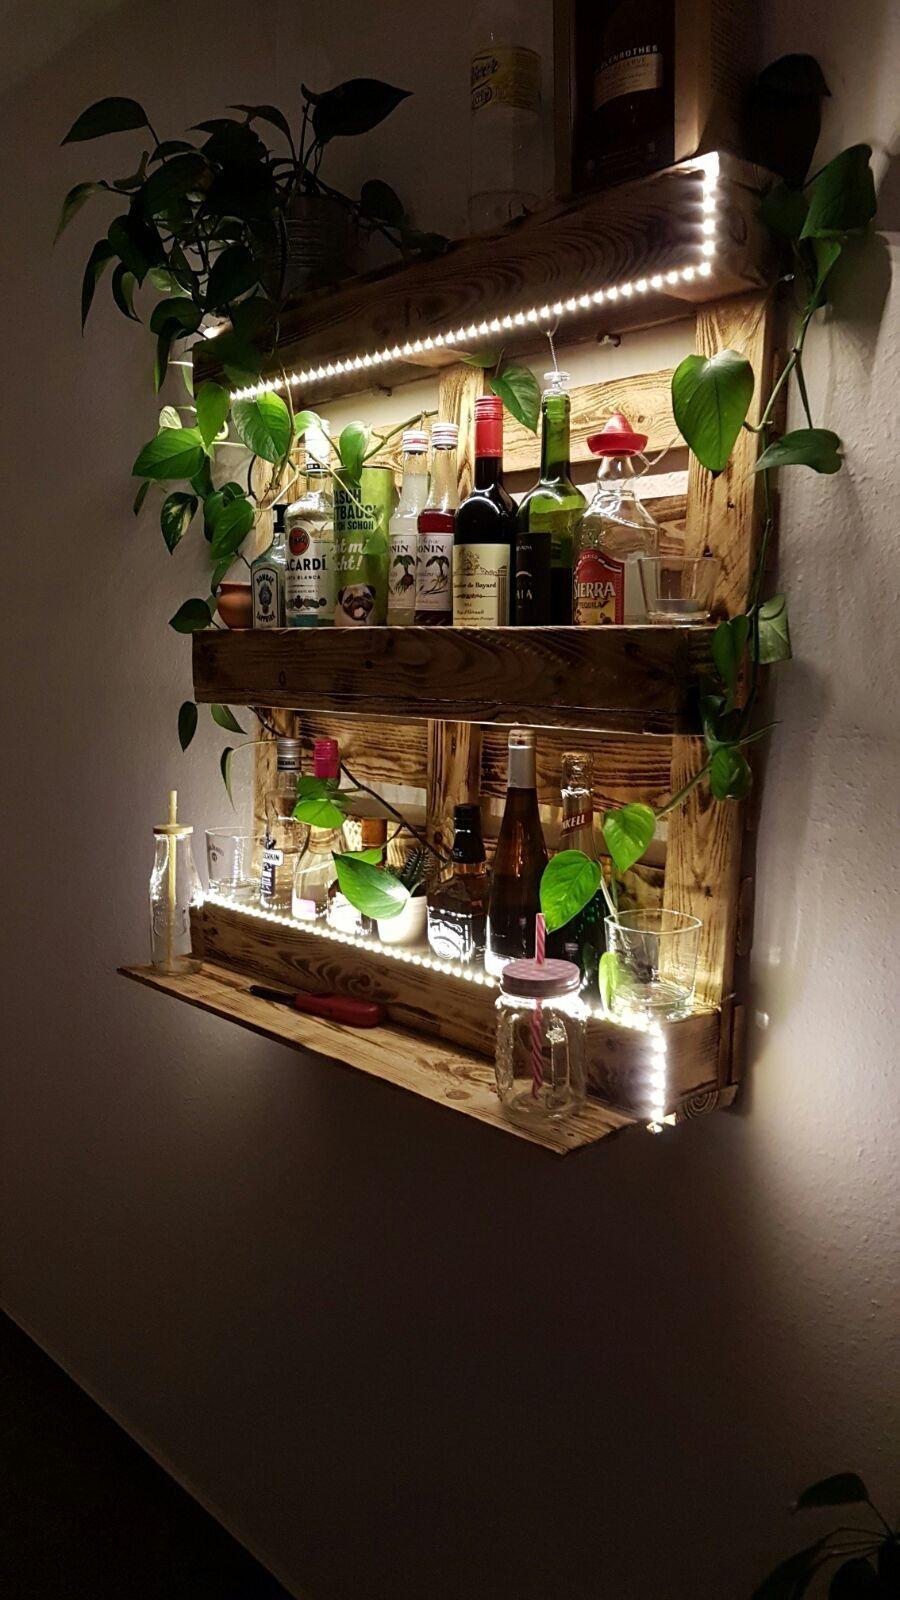 Erstaunlich Palettenregal, Bar Aus Paletten, Mit LED Beleuchtung, Holz DIY (Top Design  Backyards